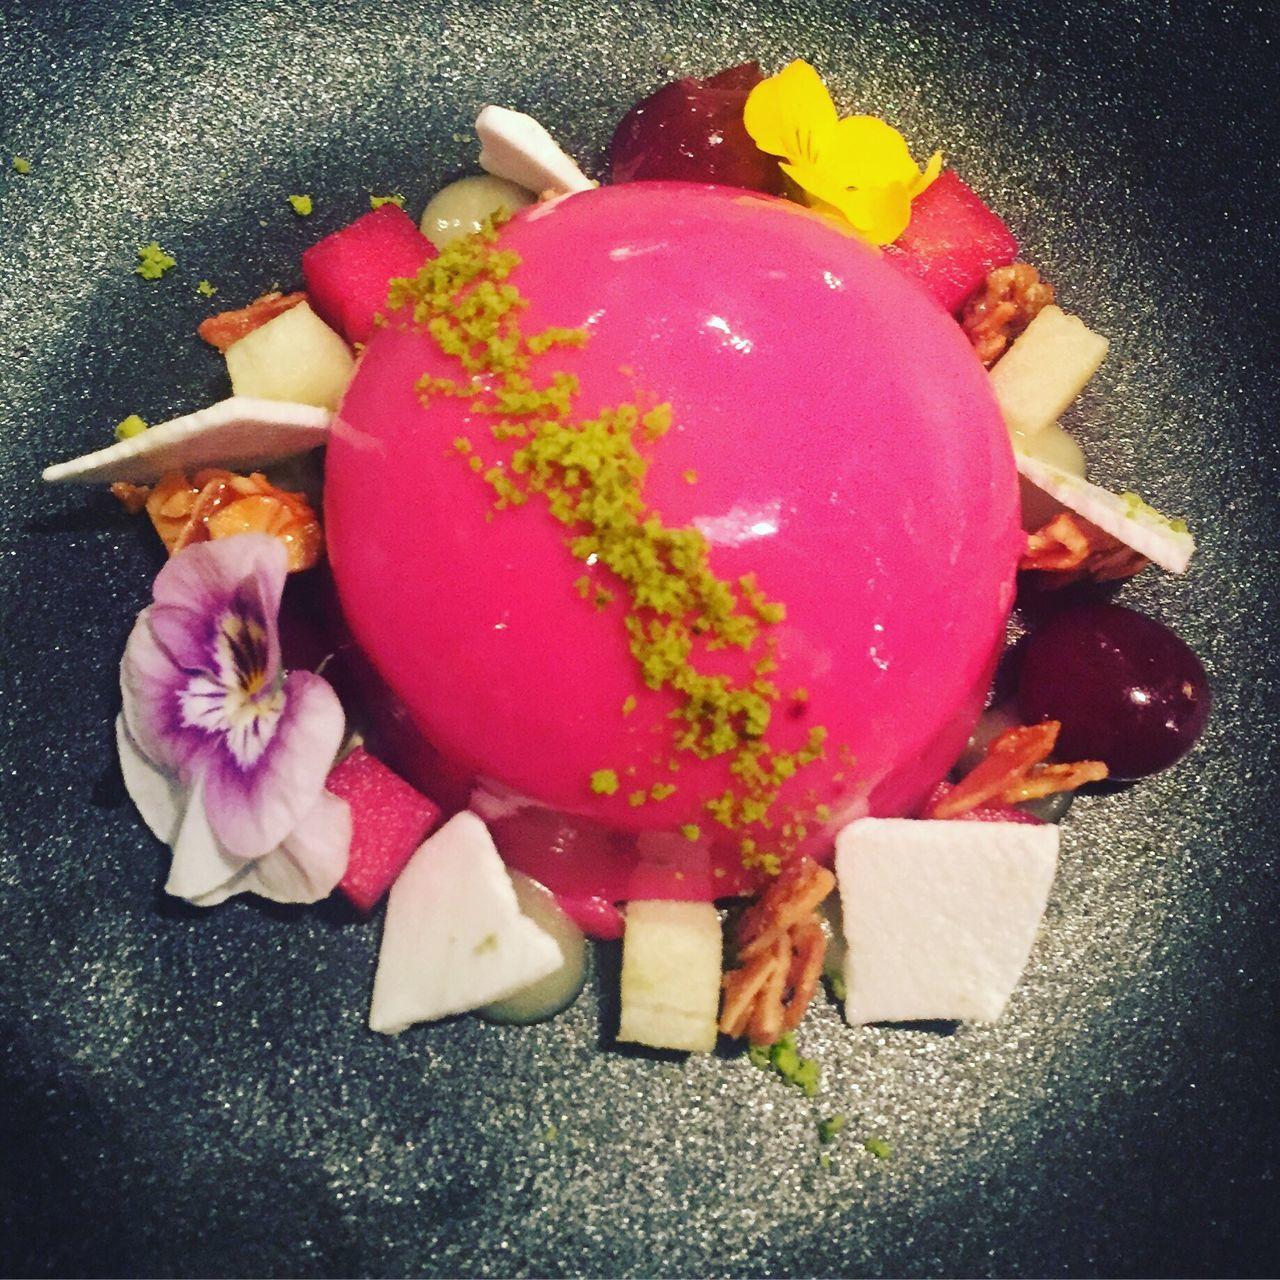 Fruity sorbet adorned with edible flowers Sweet Food Pink Color Food And Drink Food Ice Cream Dessert Dessert Porn Frozen Dessert